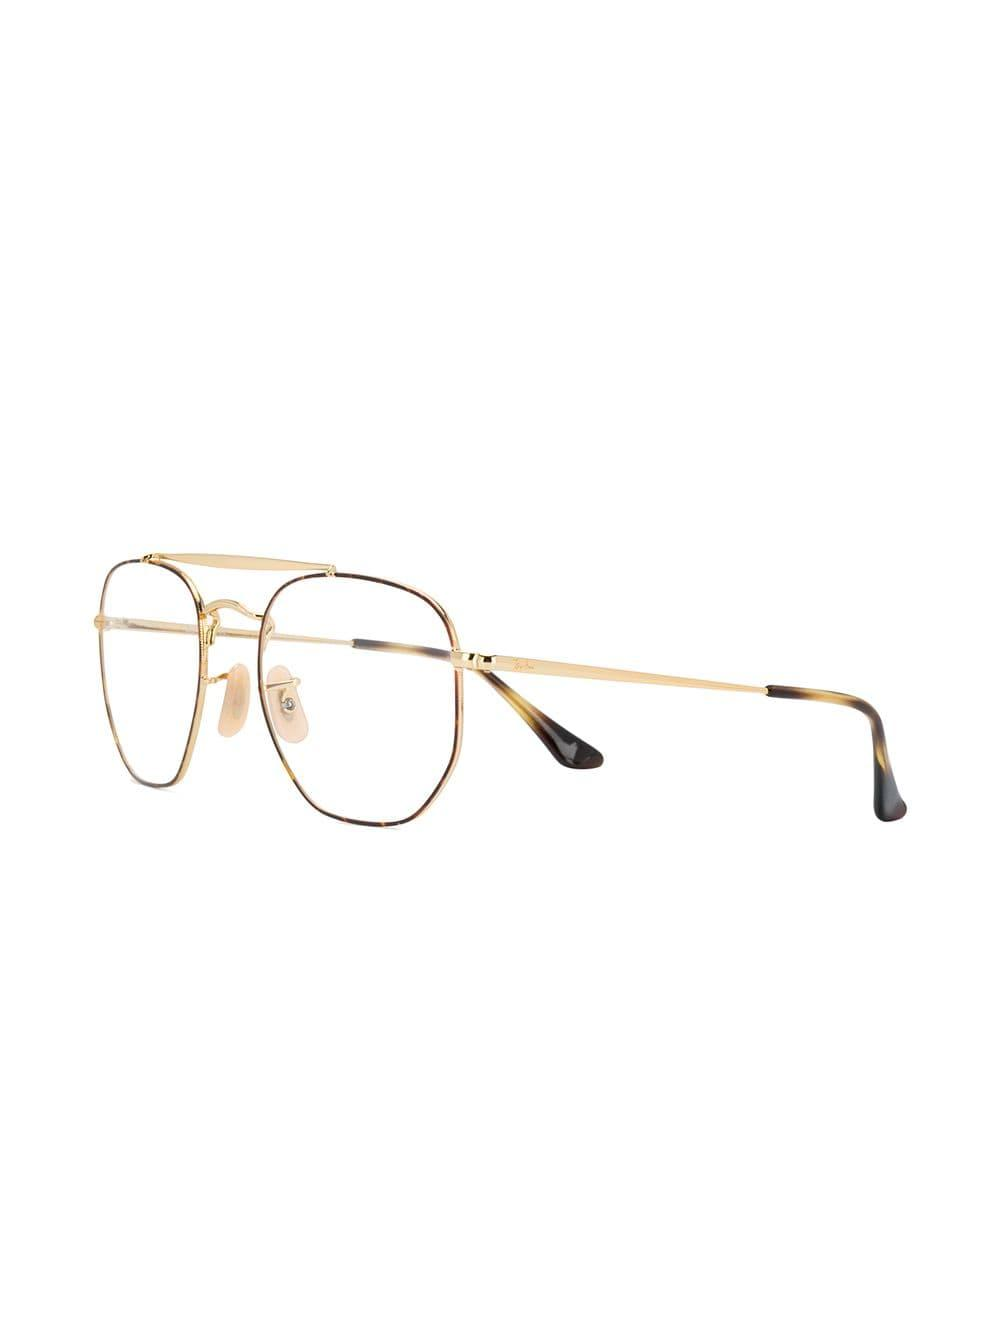 3d19eaa4f823 Ray-Ban Tortoiseshell Glasses in Metallic - Lyst